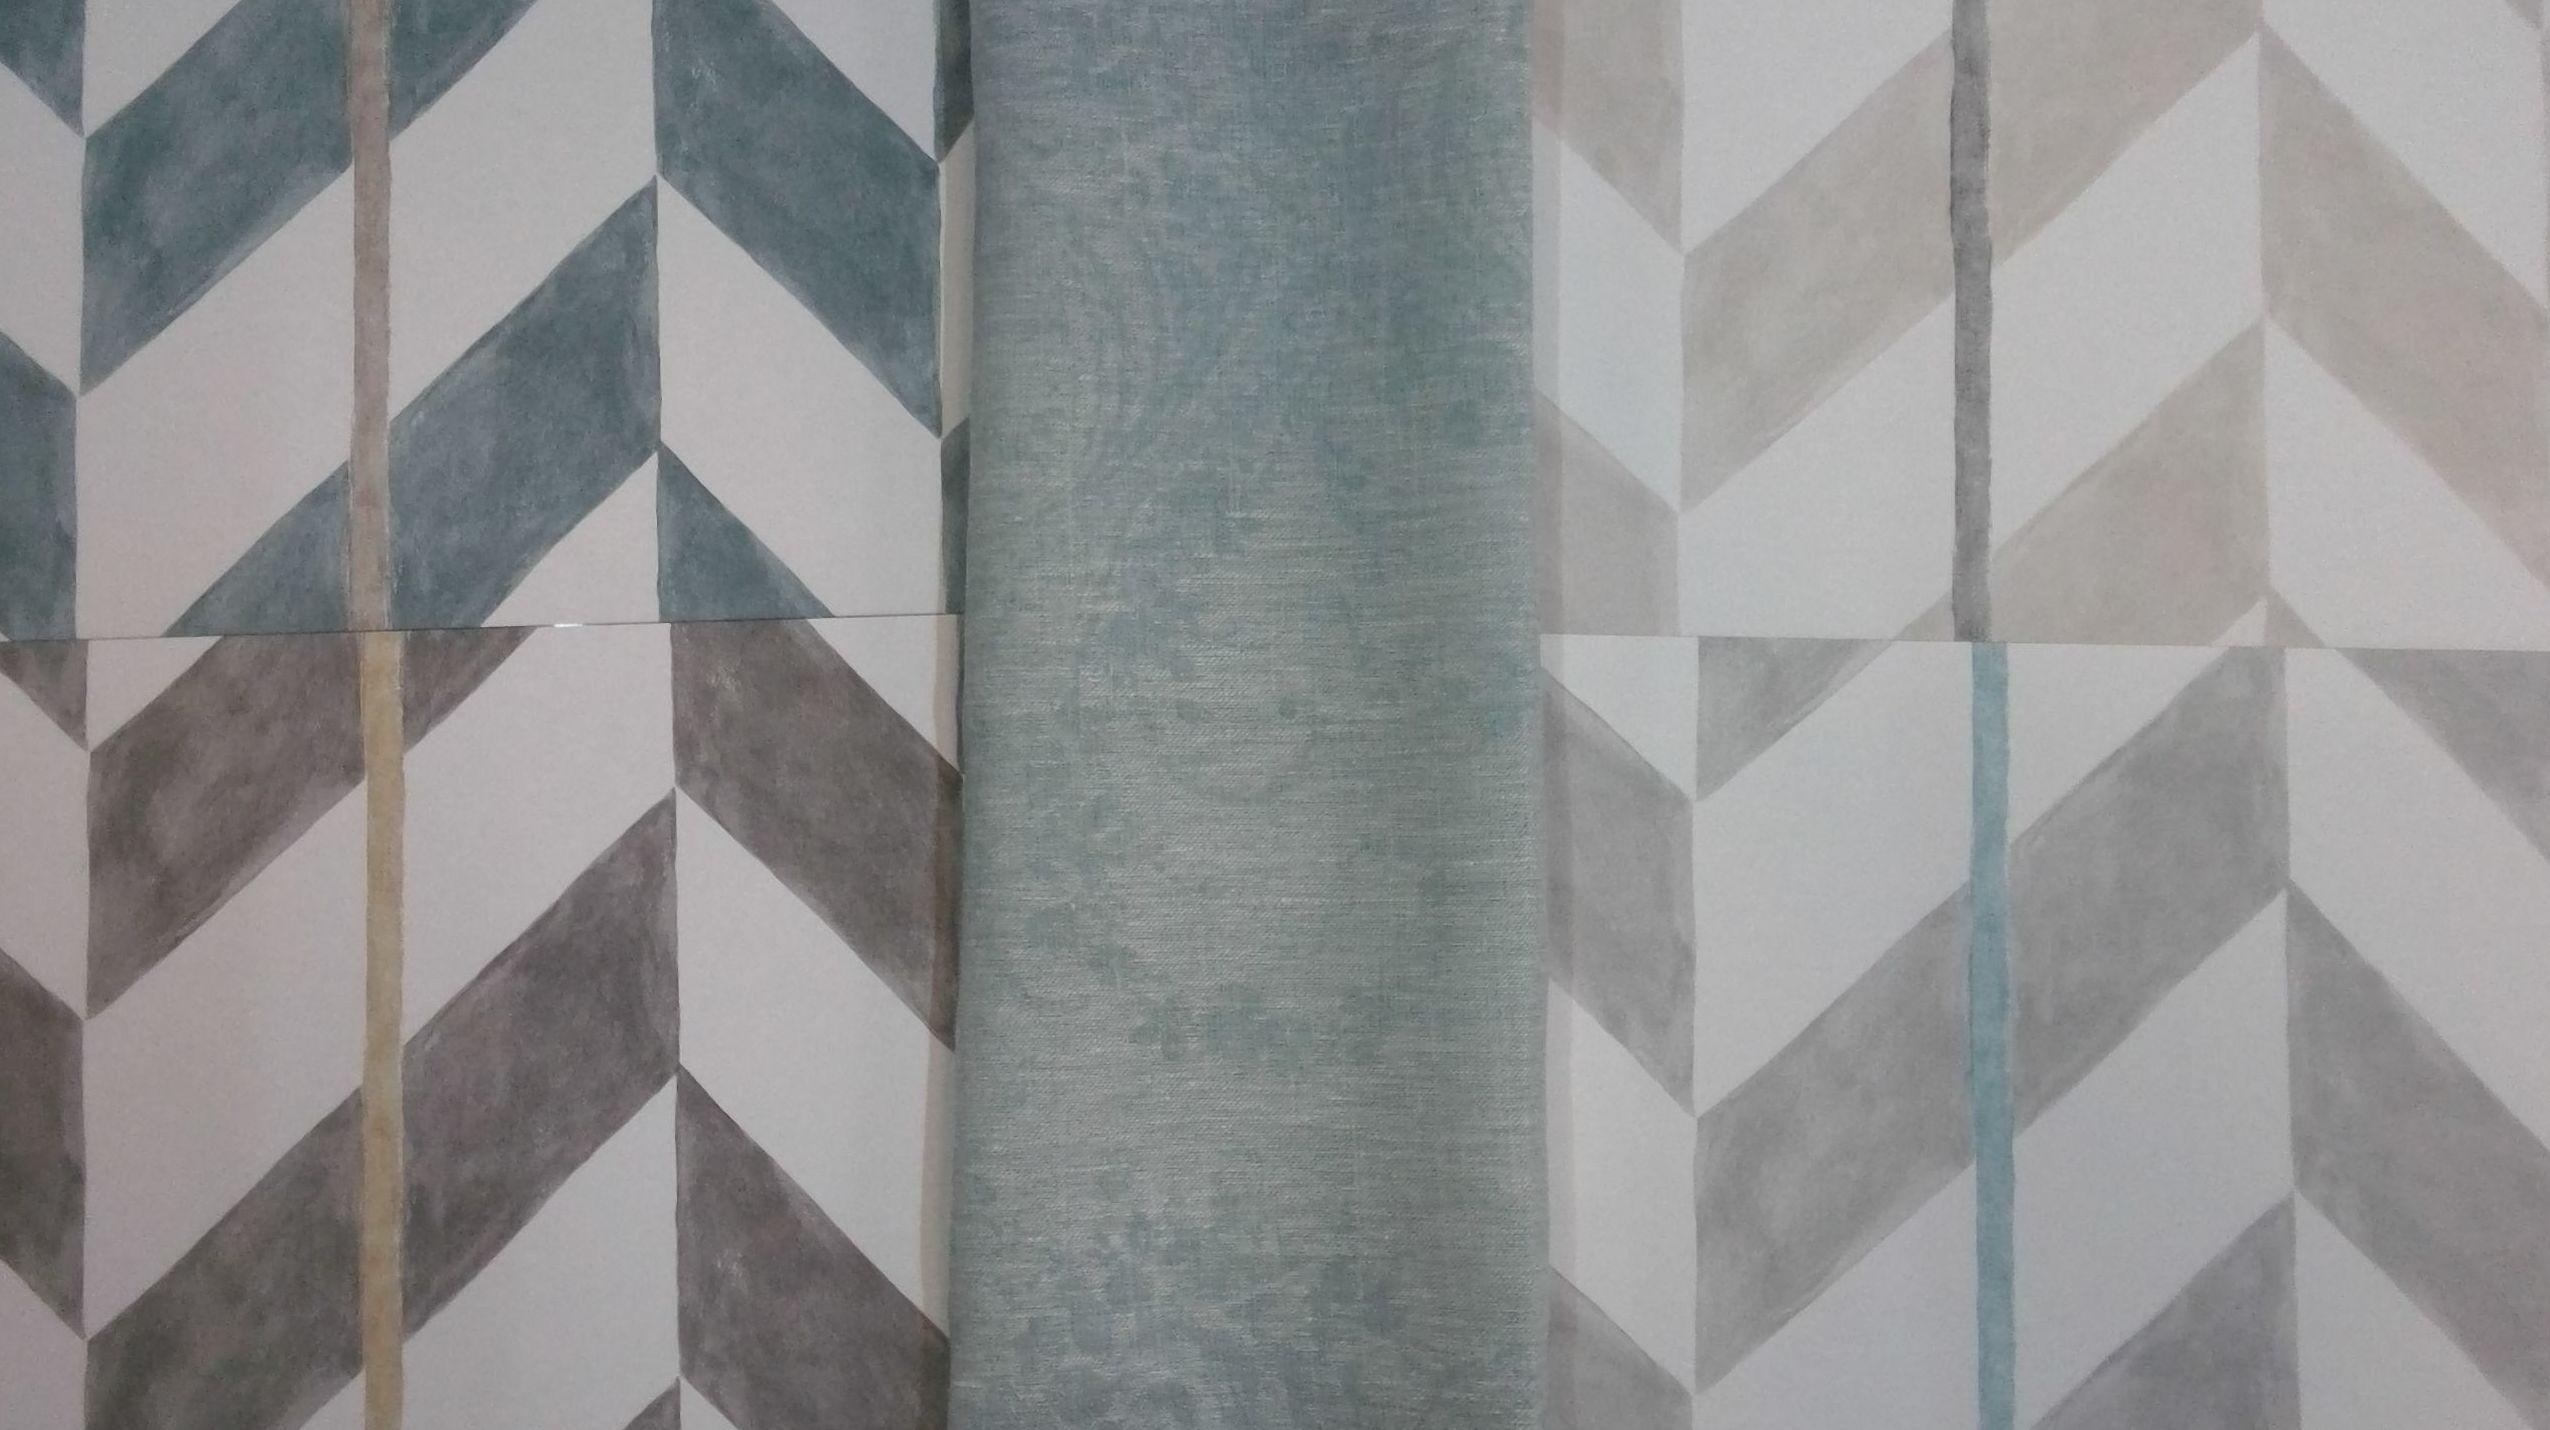 Foto 1 de Decoración textil en Madrid | Diseño Textil